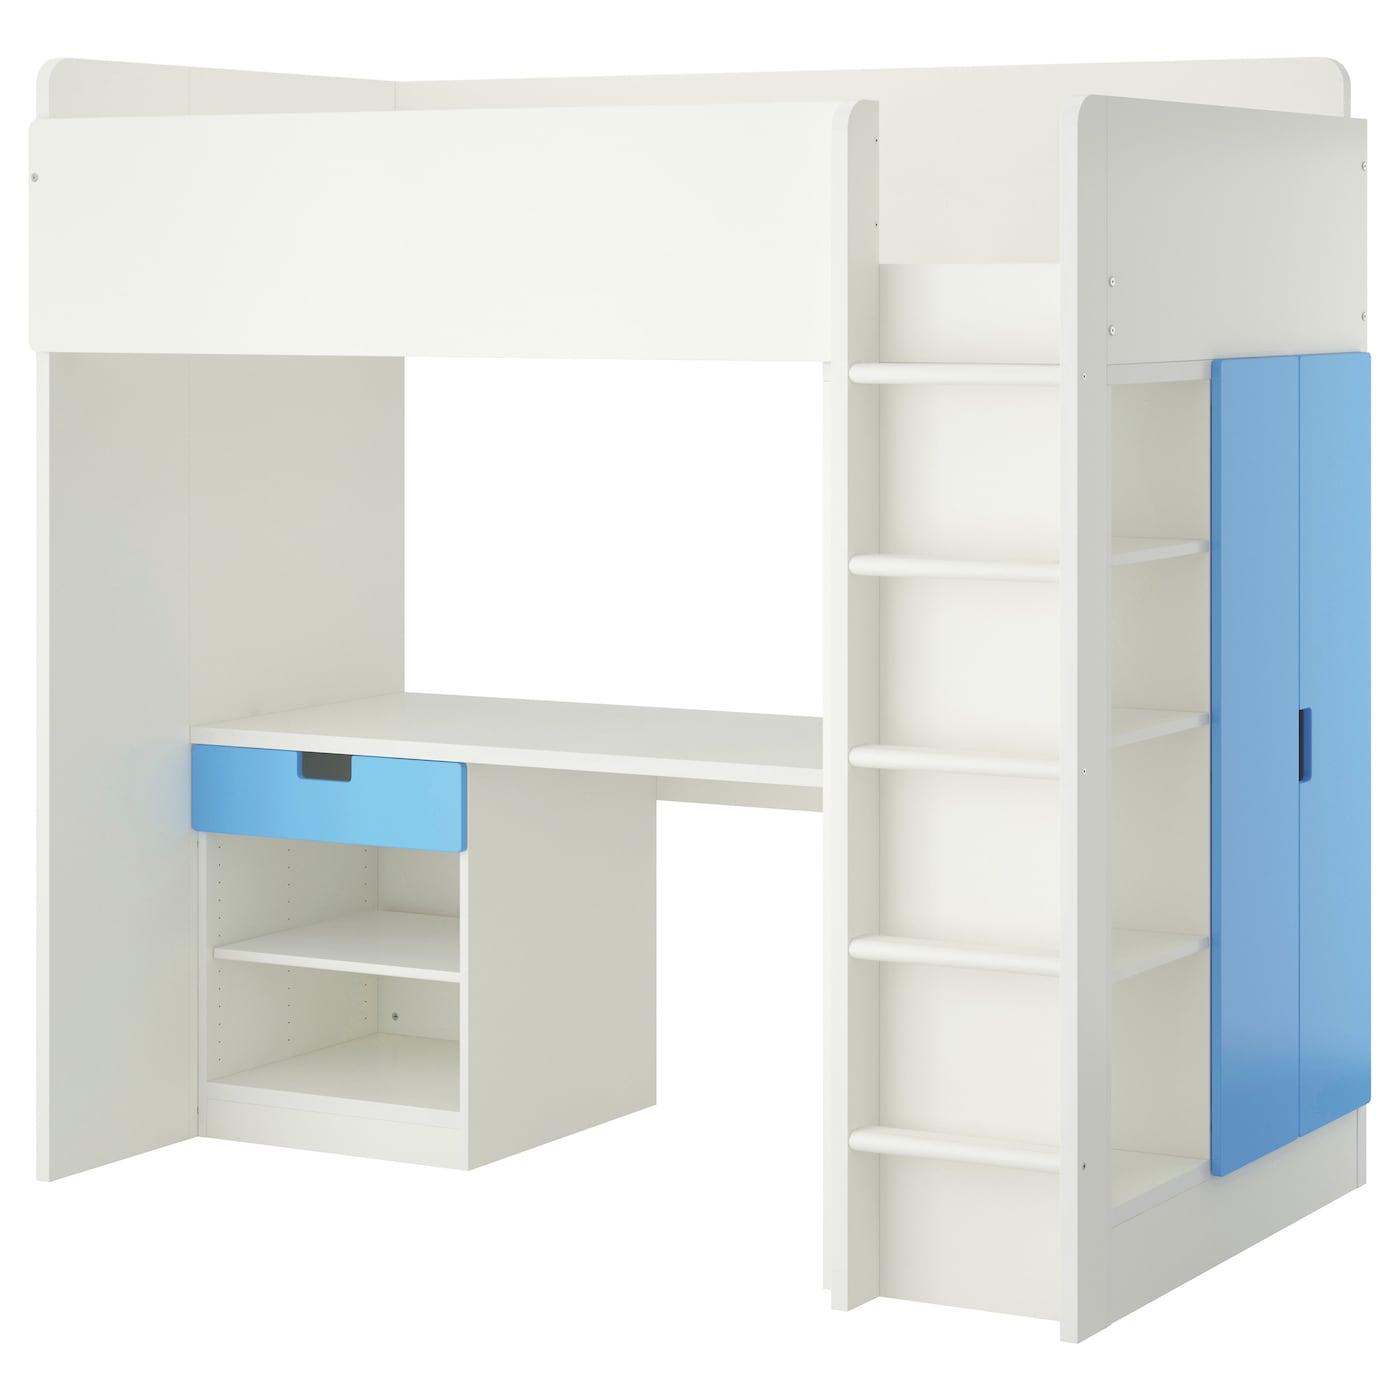 Ikea loft bed with desk - Ikea Stuva Loft Bed Combo W 1 Drawer 2 Doors